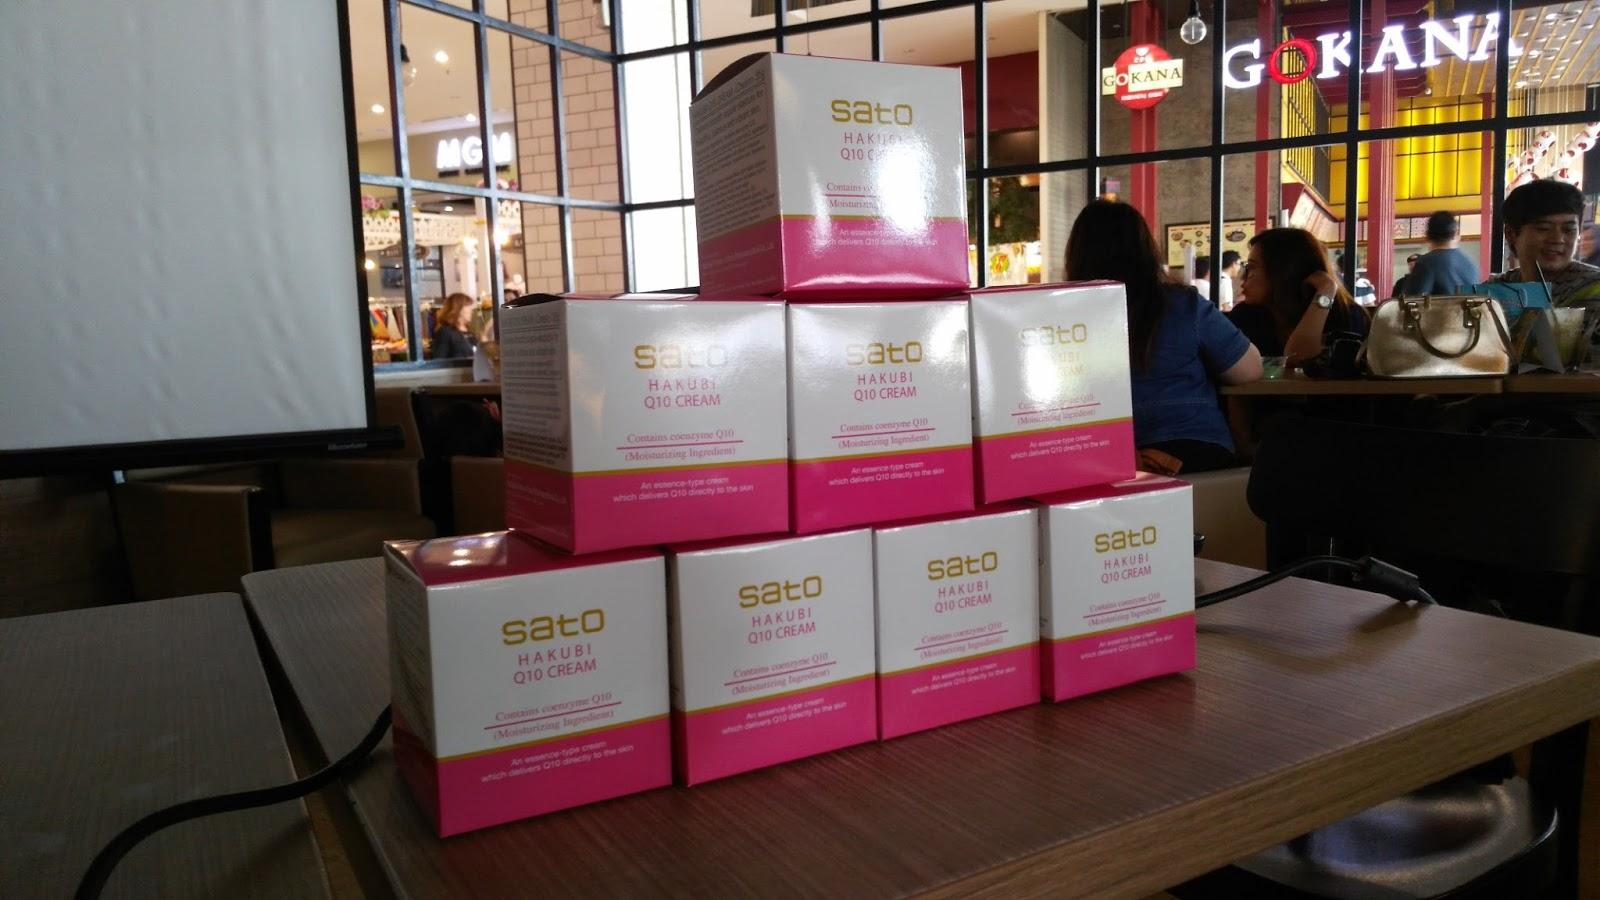 Casual Blogger Gathering Ala Sato Hakubi Q10 Cream X Dan Store Pastaron Di Kopilatinum Acara Berlangsung Sangat Santai Akrab Penyelenggara Memang Sengaja Tidak Mengundang Terlalu Banyak Orang Supaya Lebih Intimate